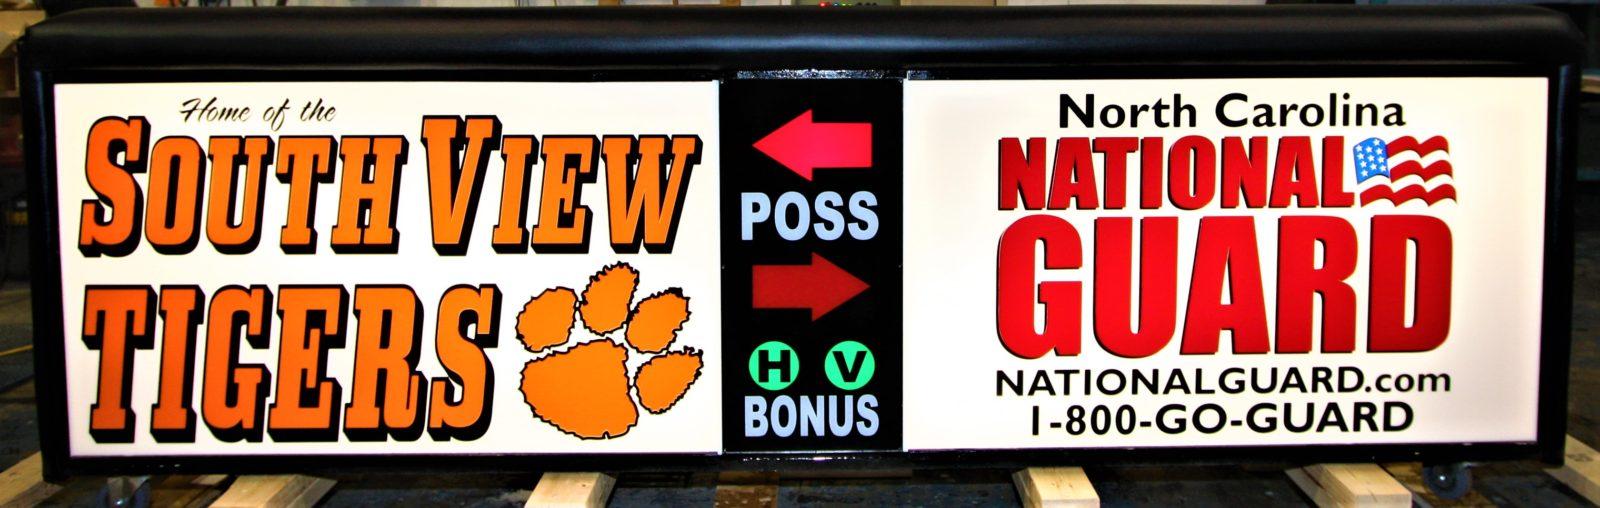 South View High School scoring table North Carolina Army National Guafrd NCARNG